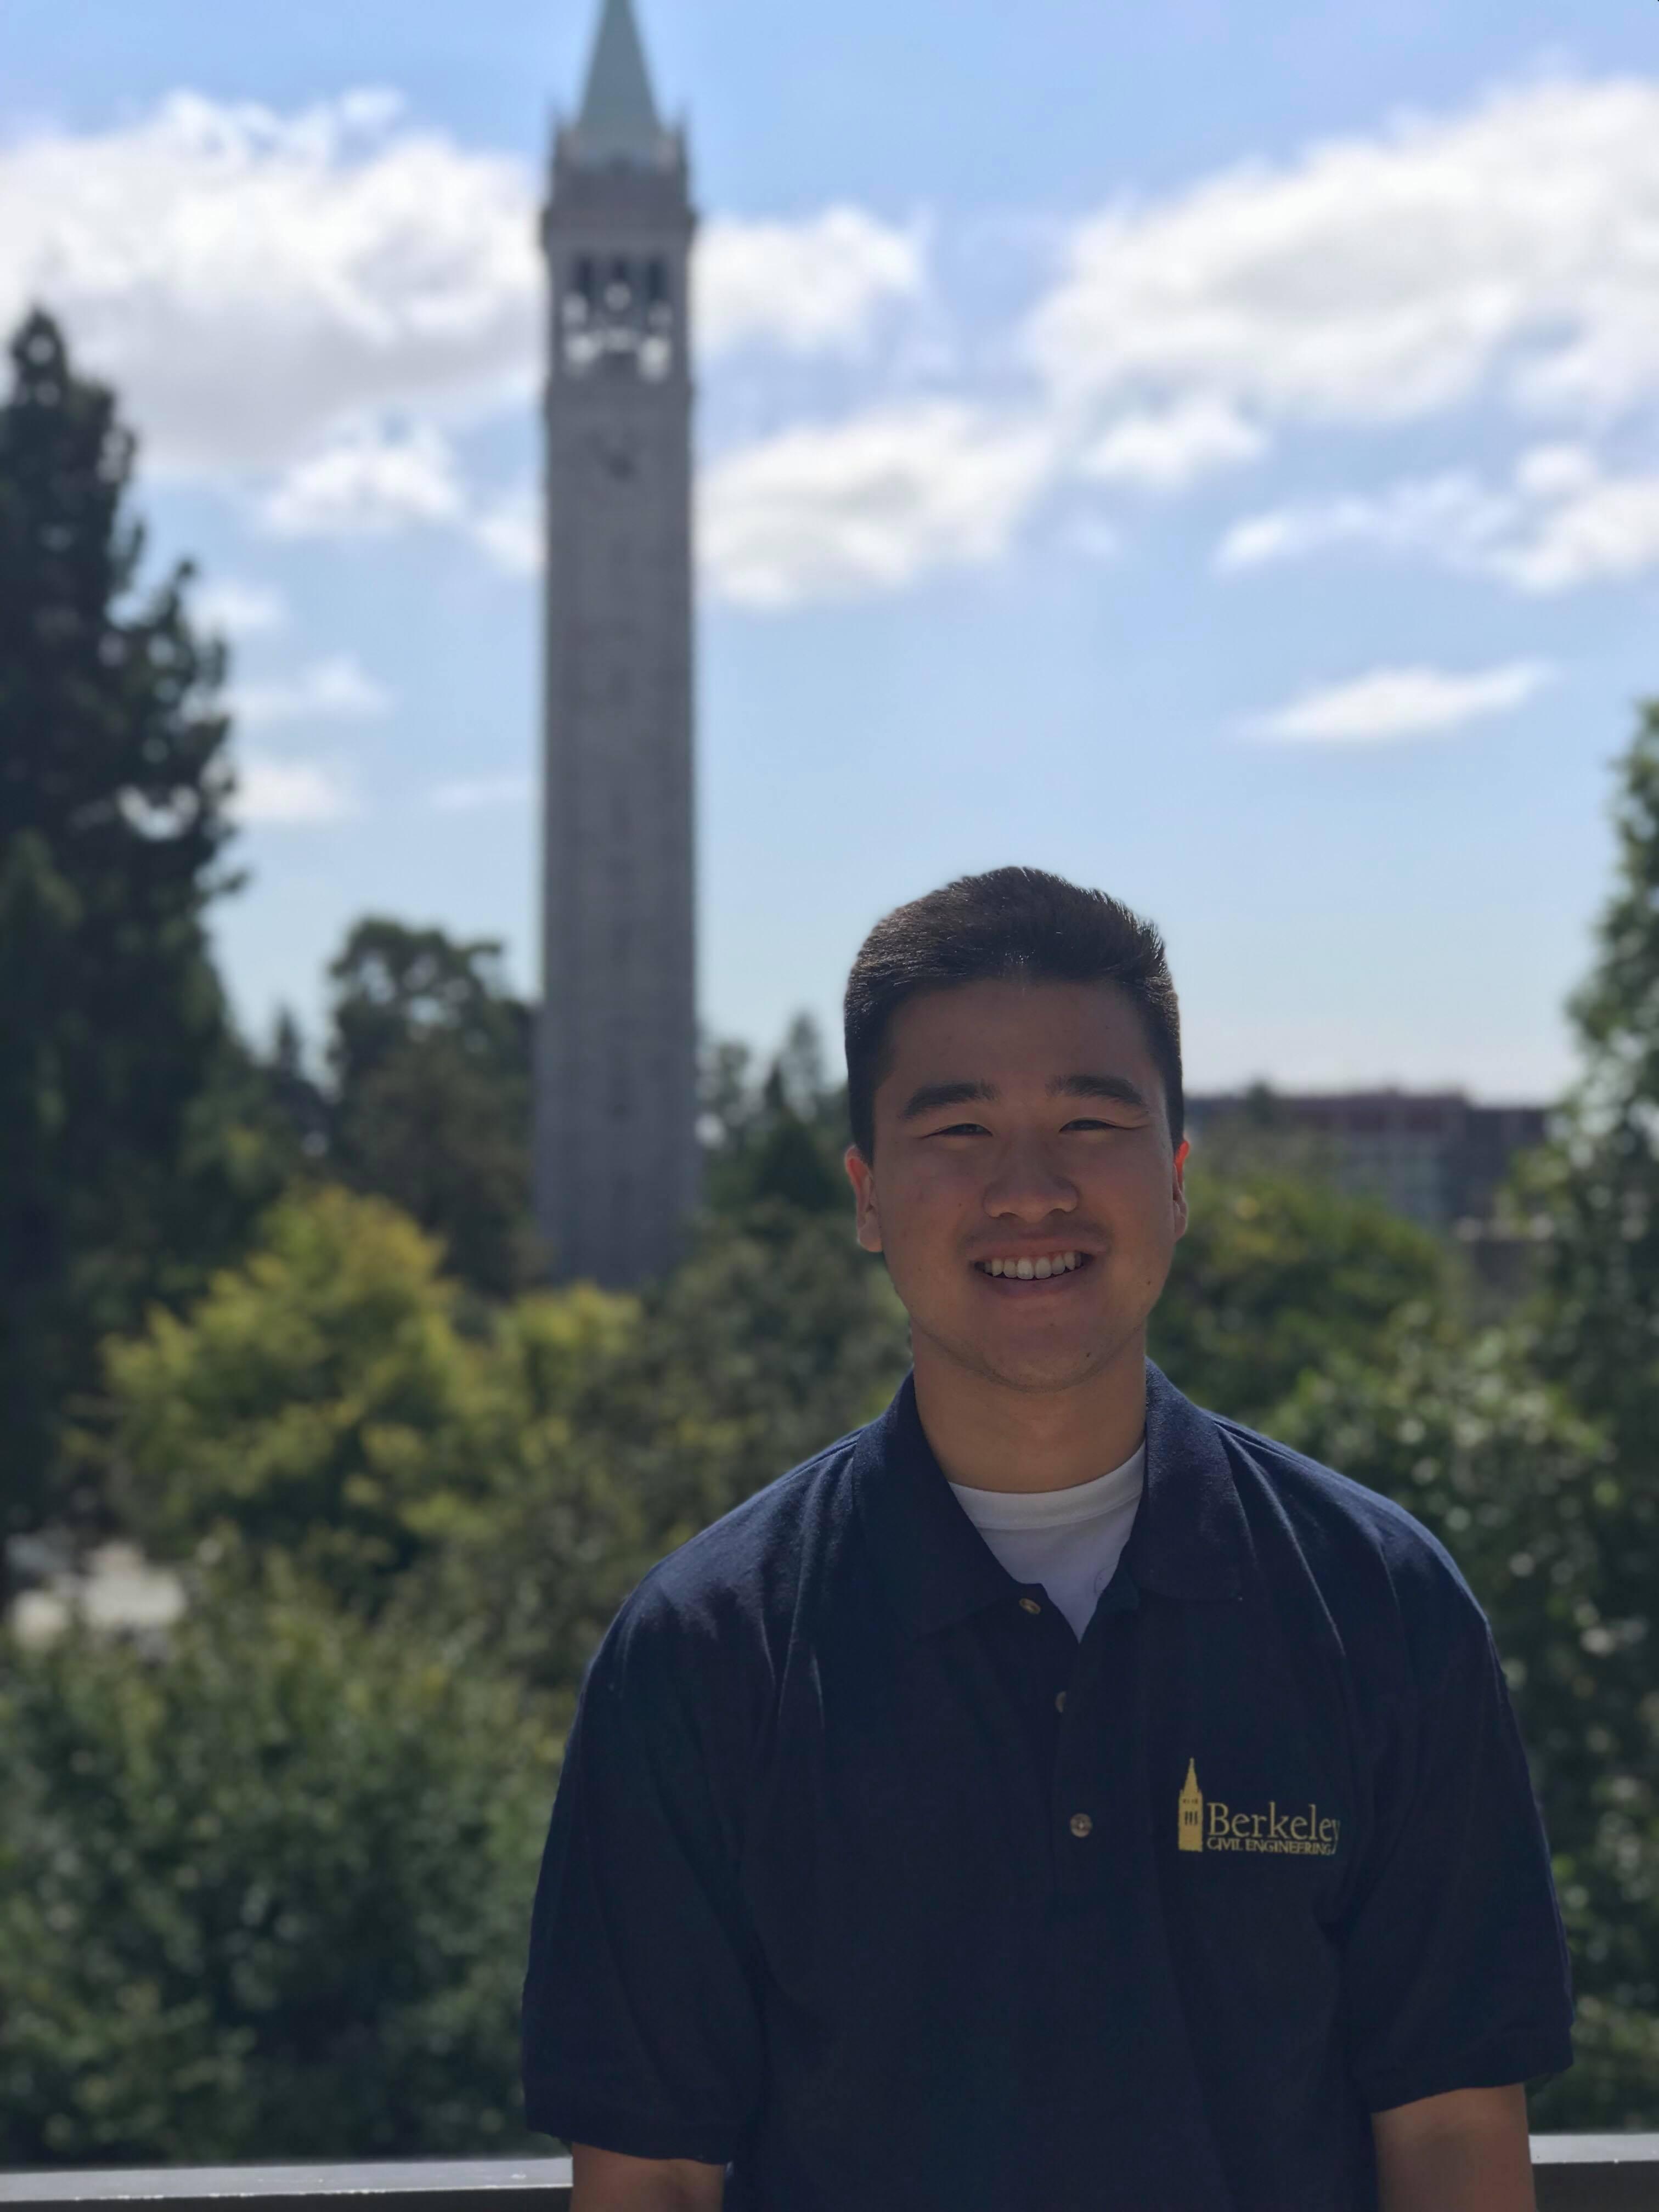 Berkeley CEE Polo